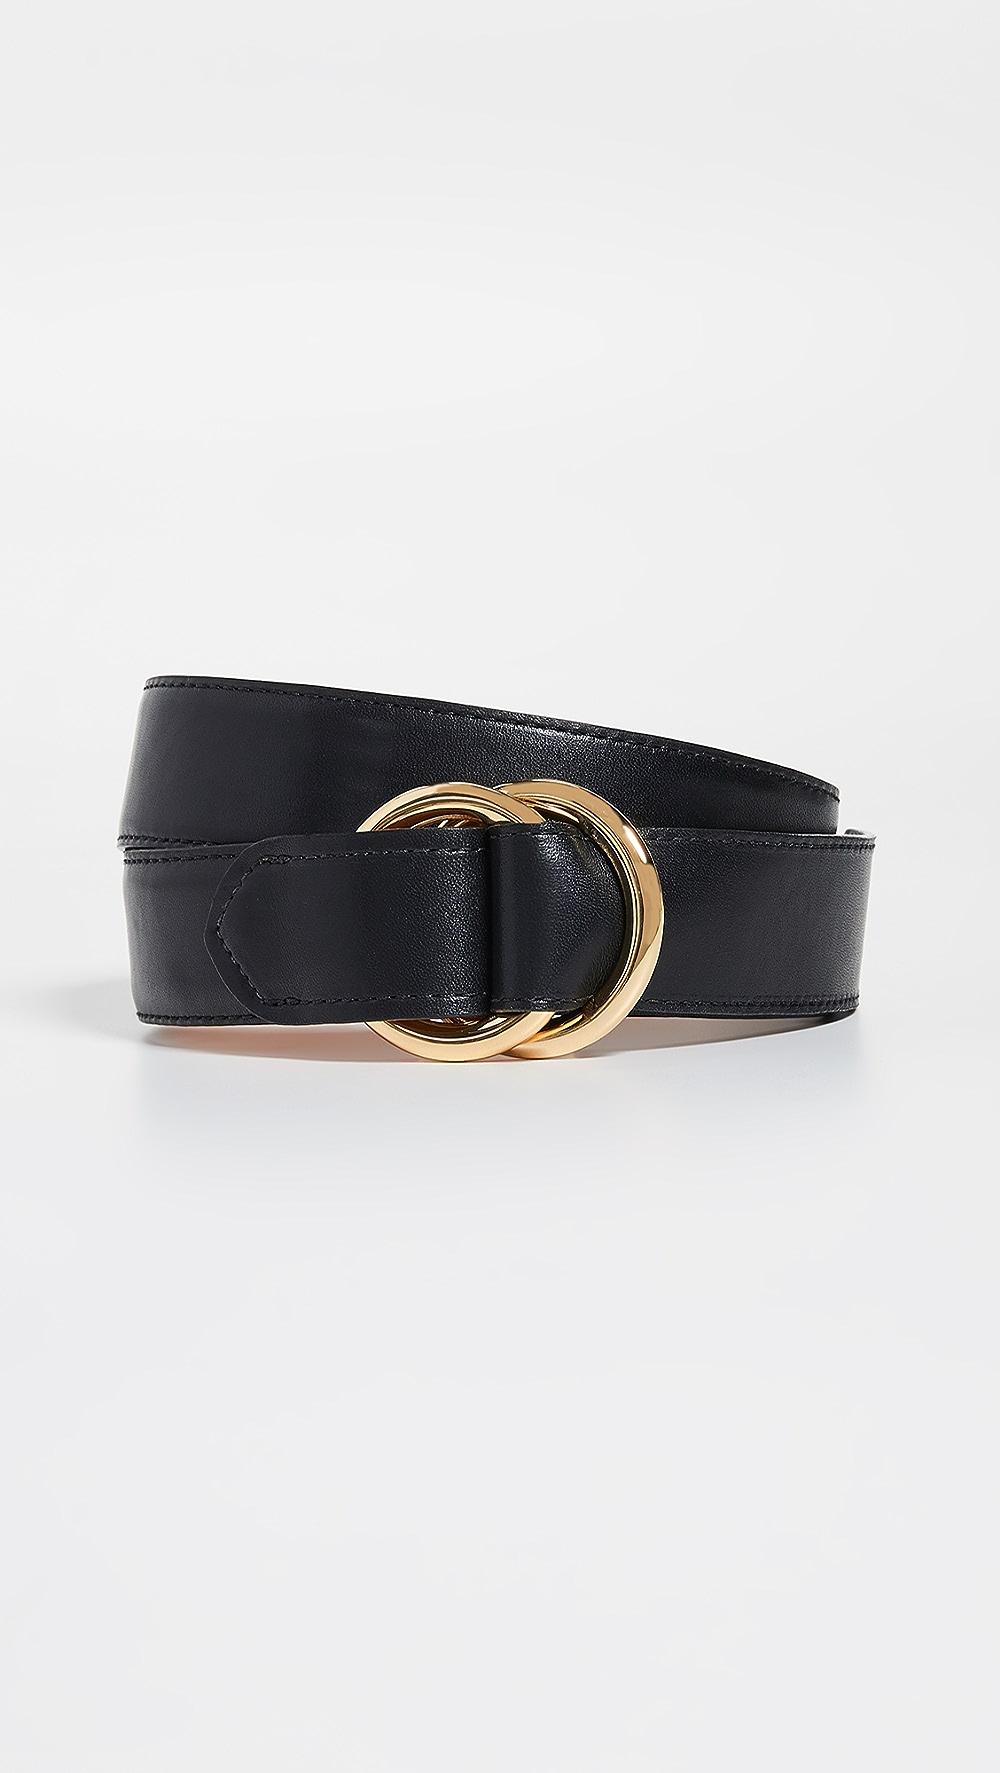 NEW  GLAZED BLACK leather BELT sizes 40 42  L  XL LAST 4 CHEAP